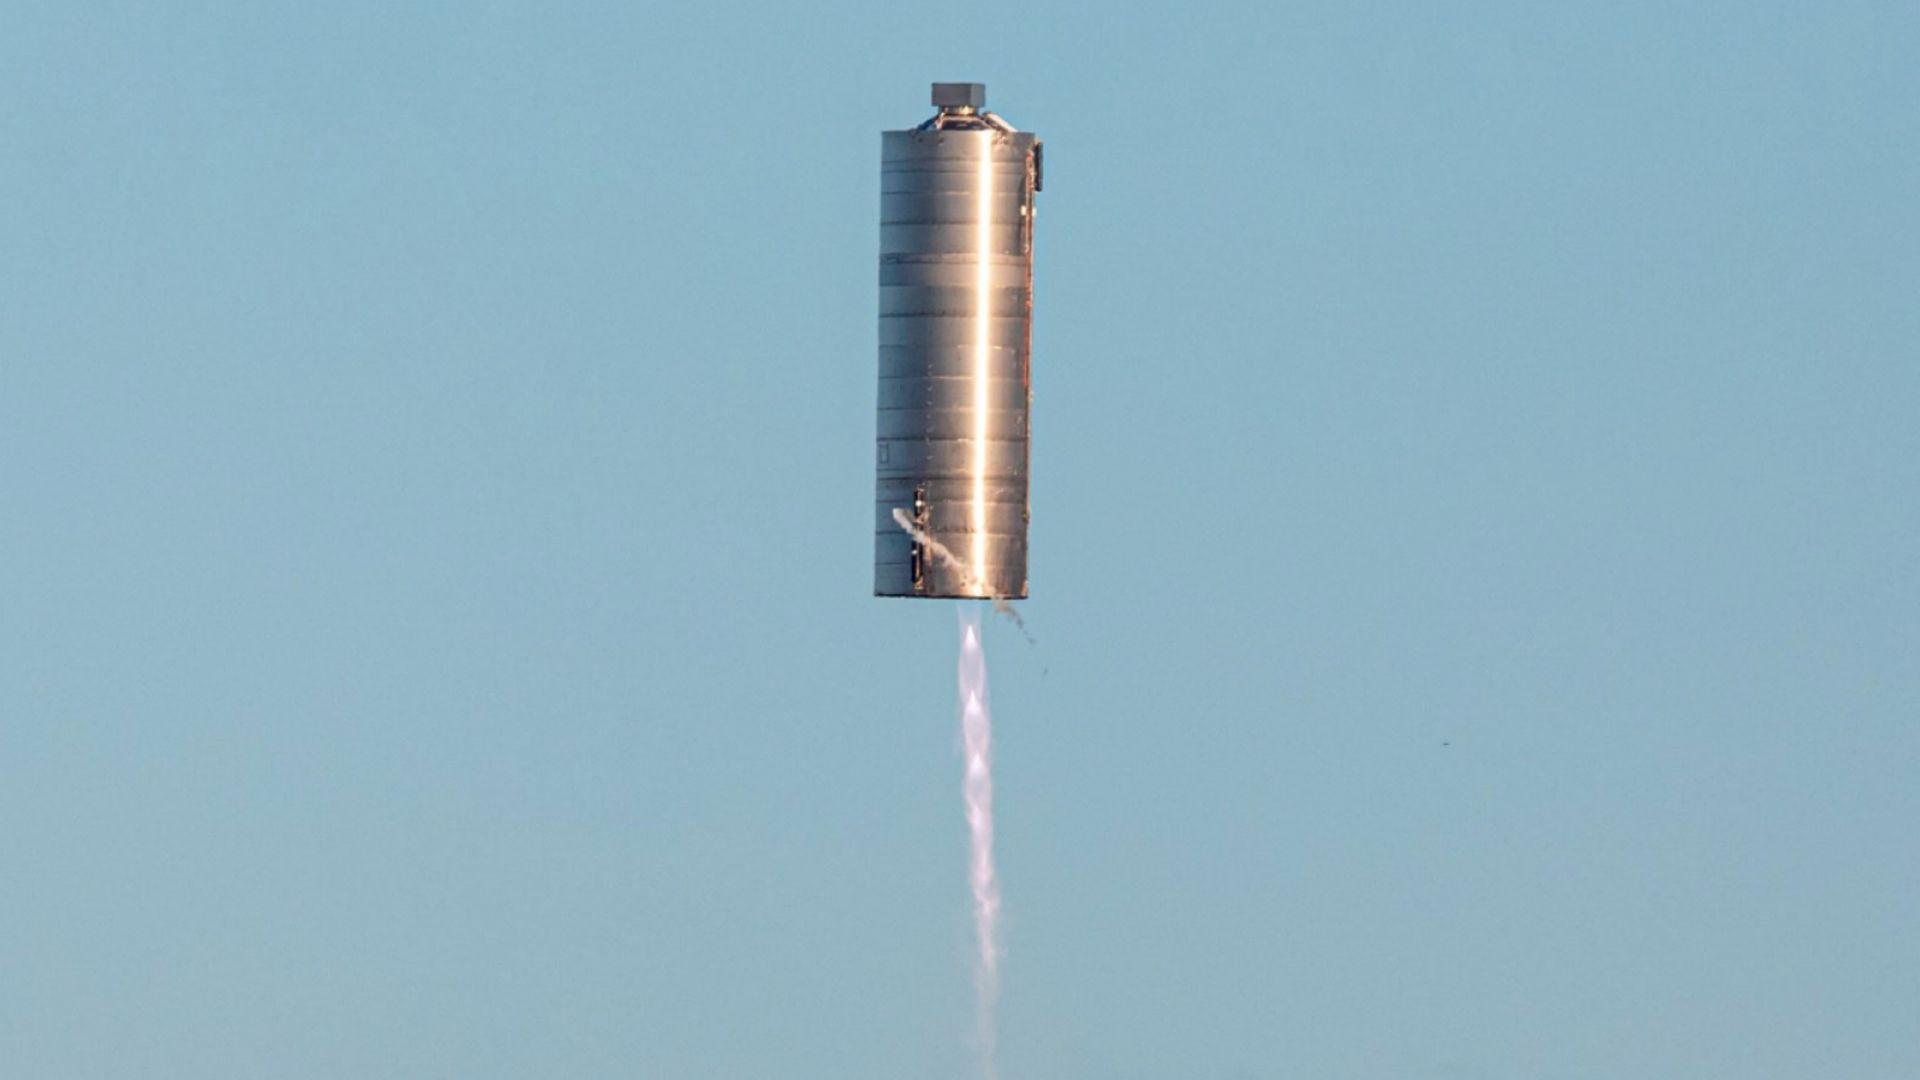 Прототипът Starship SN5 успешно осъществи своя първи полет